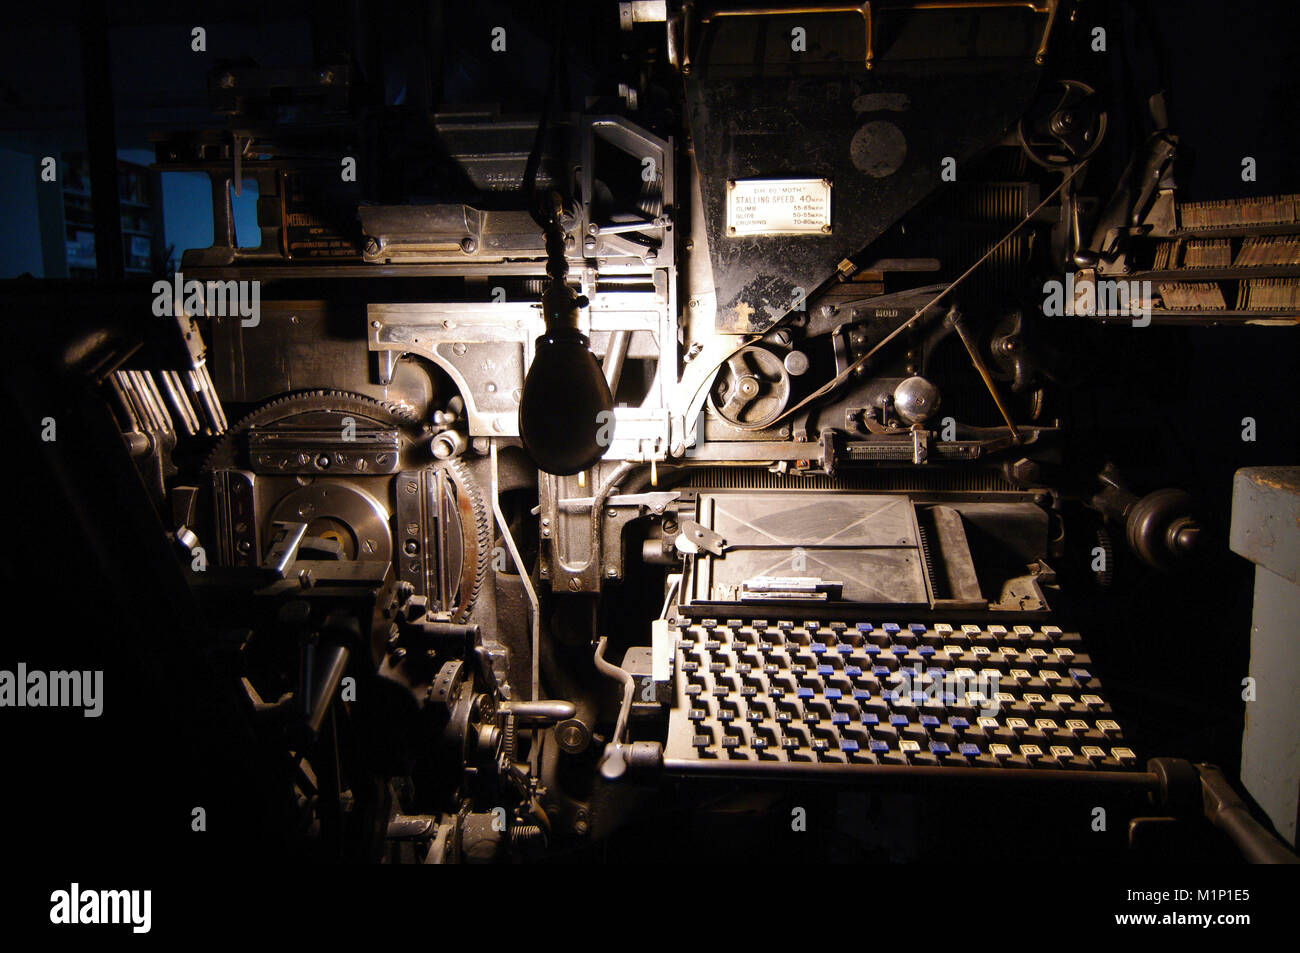 Linotype Stock Photos & Linotype Stock Images - Alamy